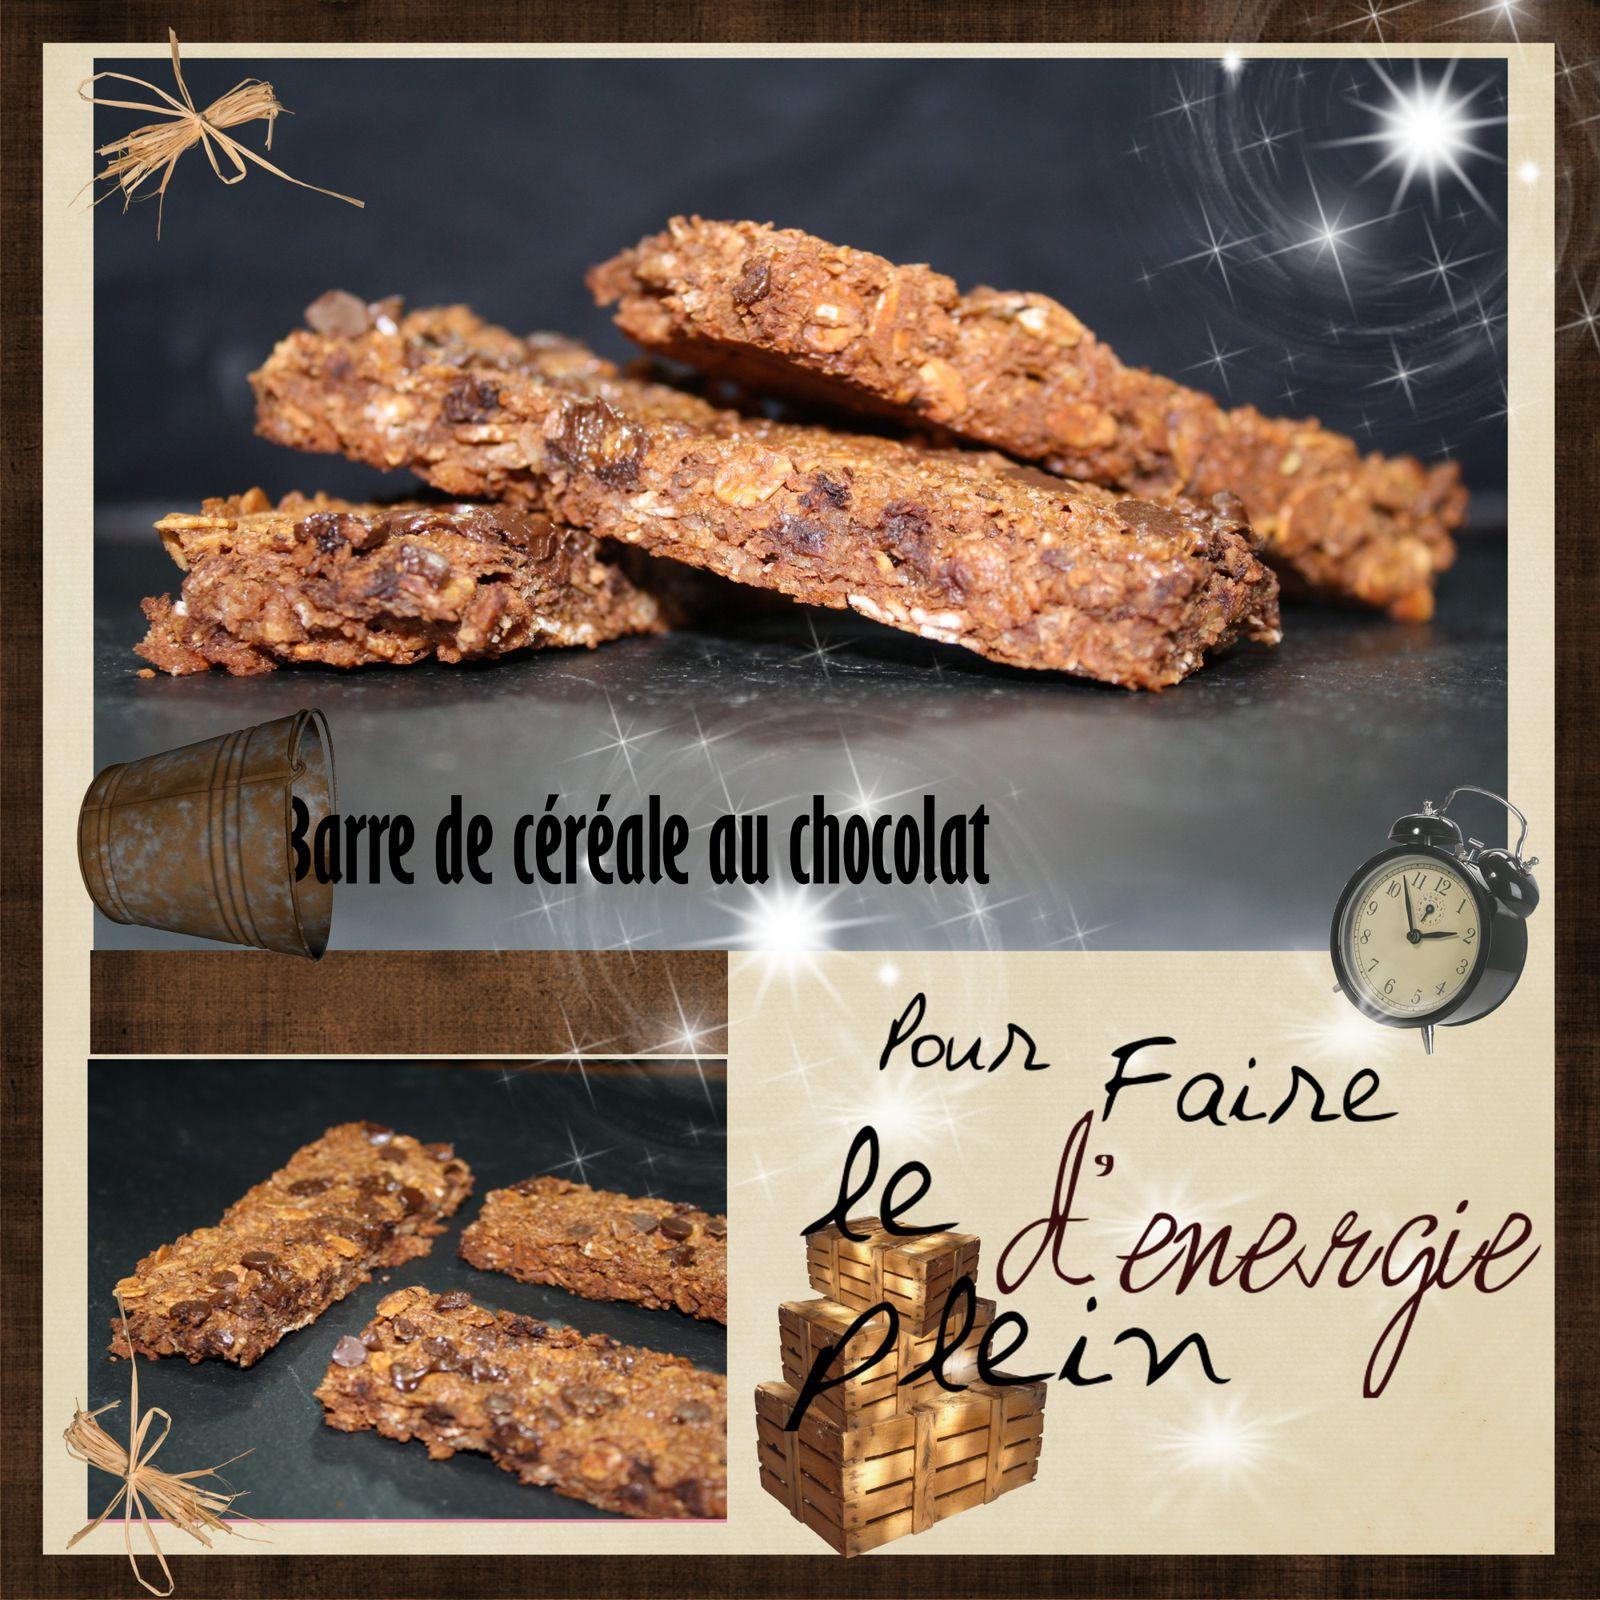 barre de céréale maison Barre-de-cereale-au-chocolat